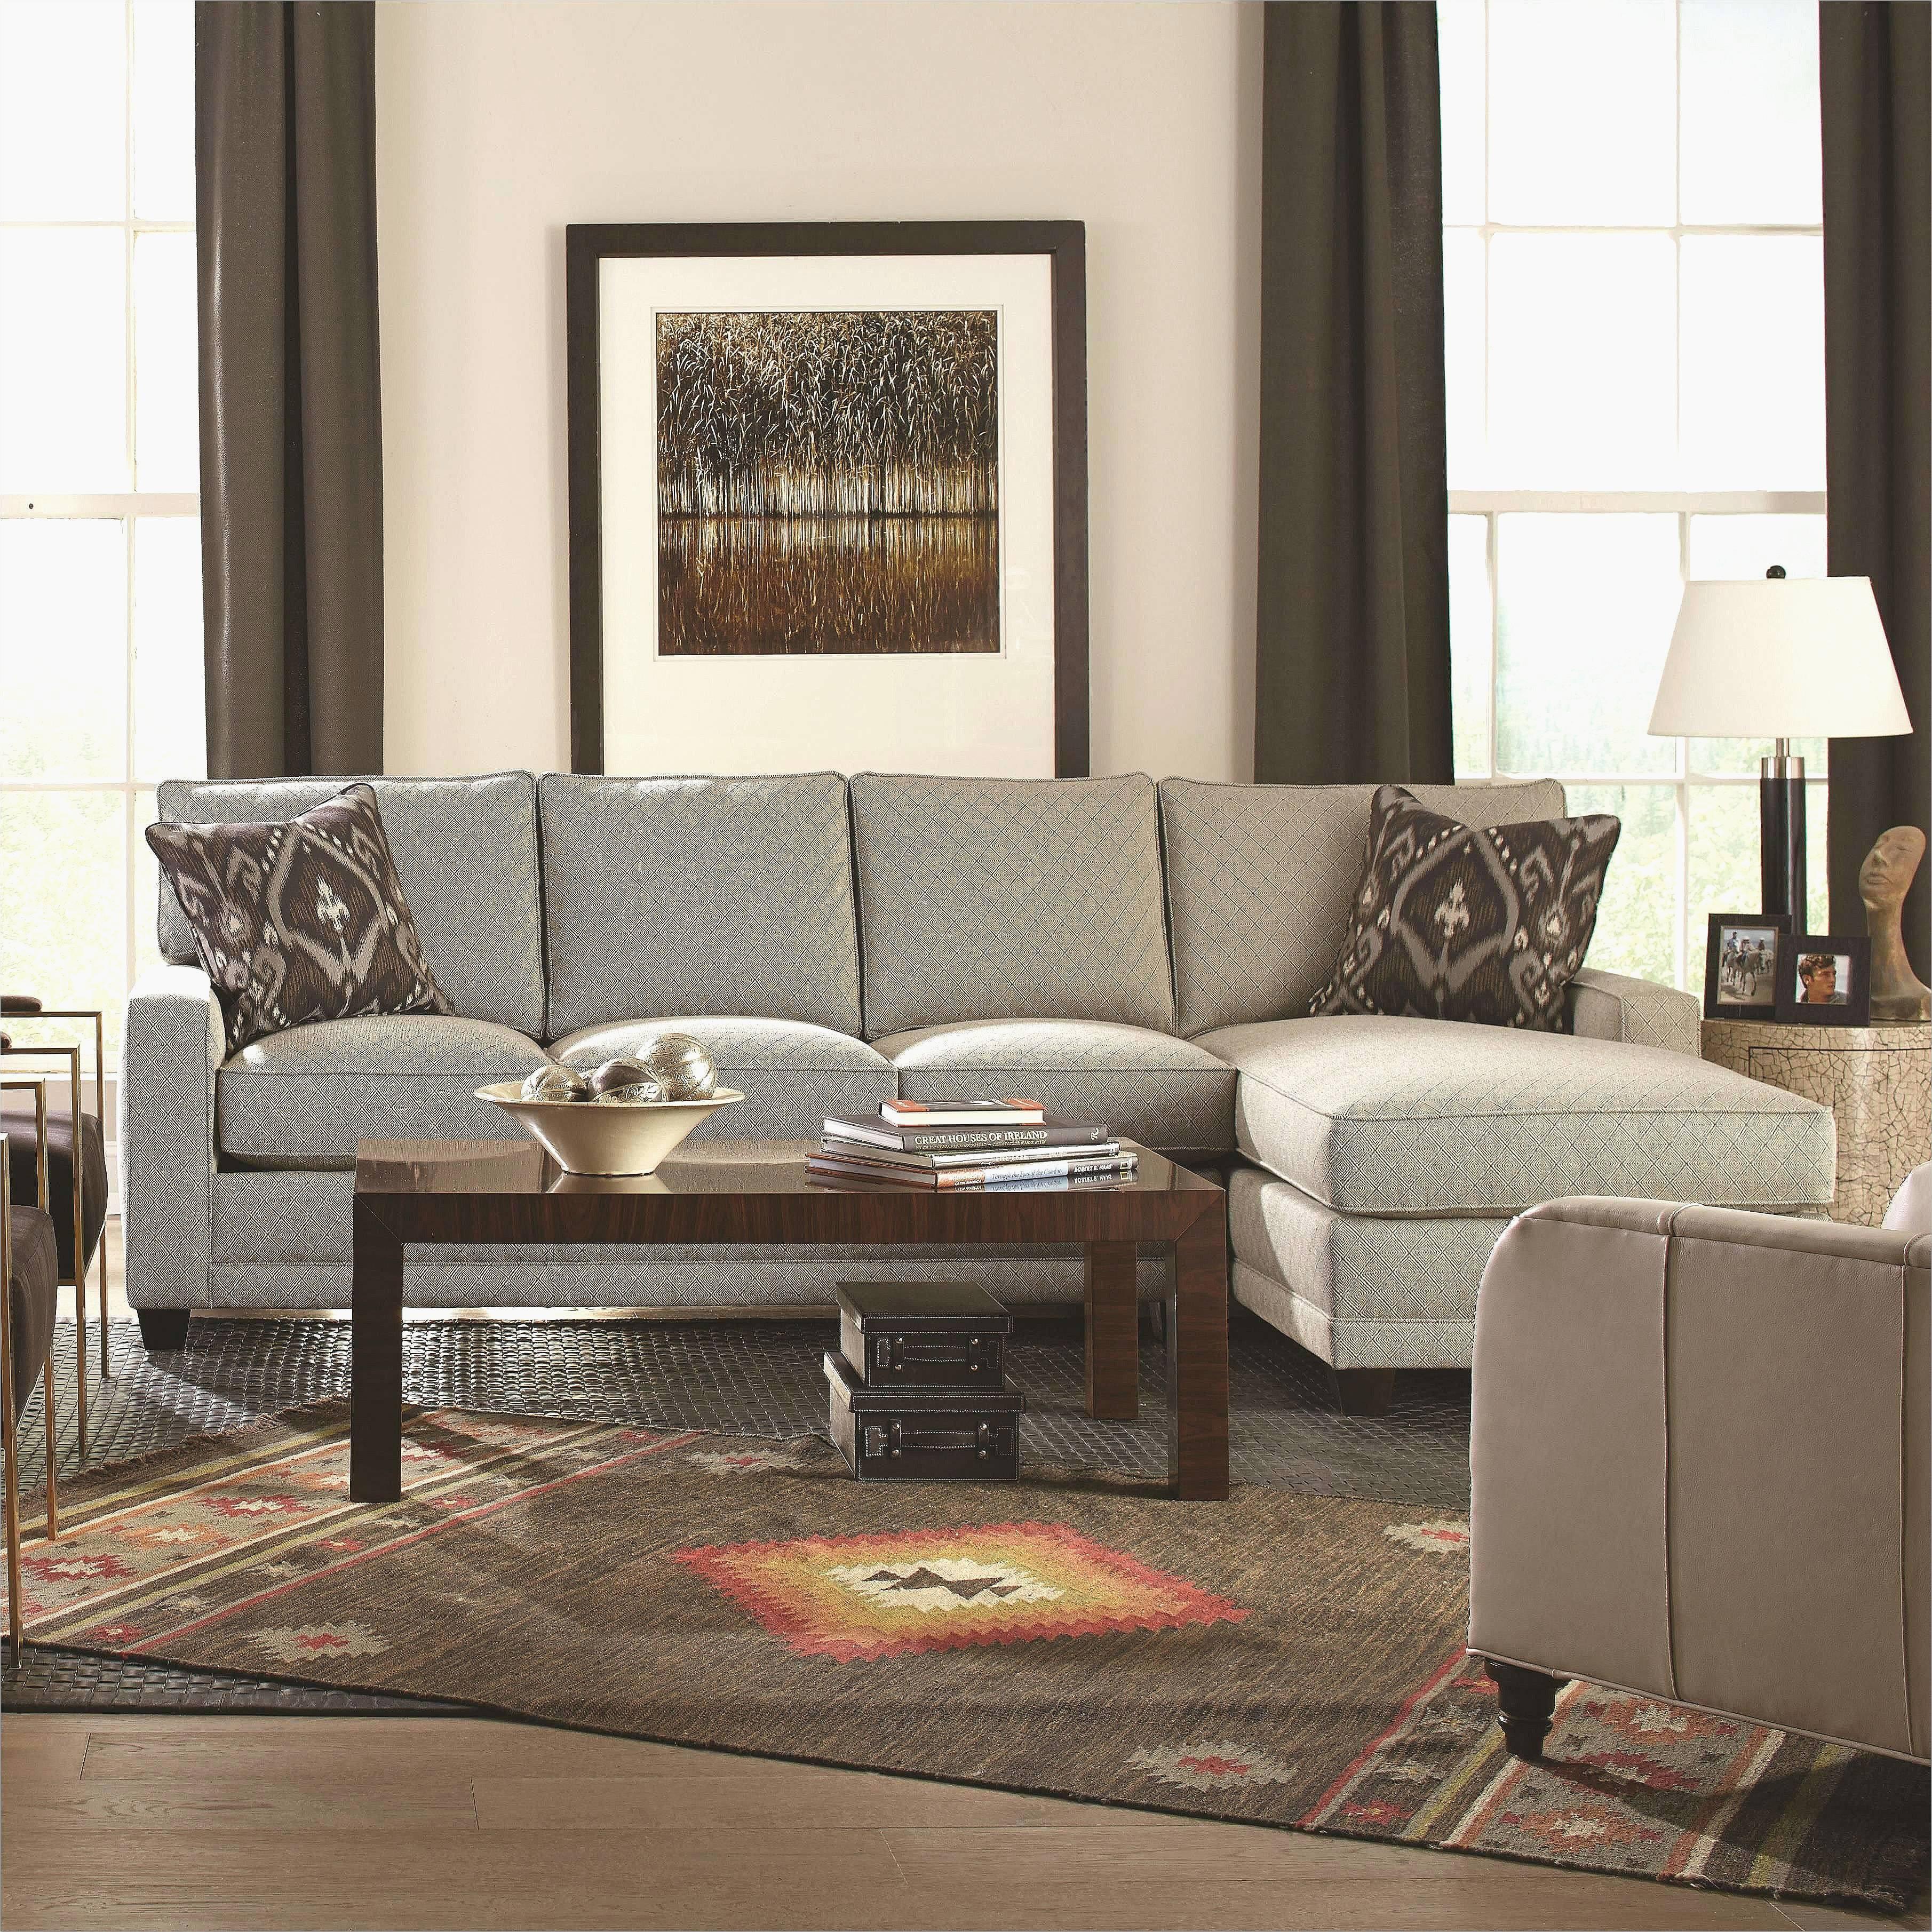 modern living room design ideas news 36 luxury modern room decor ideas image of modern living room design ideas